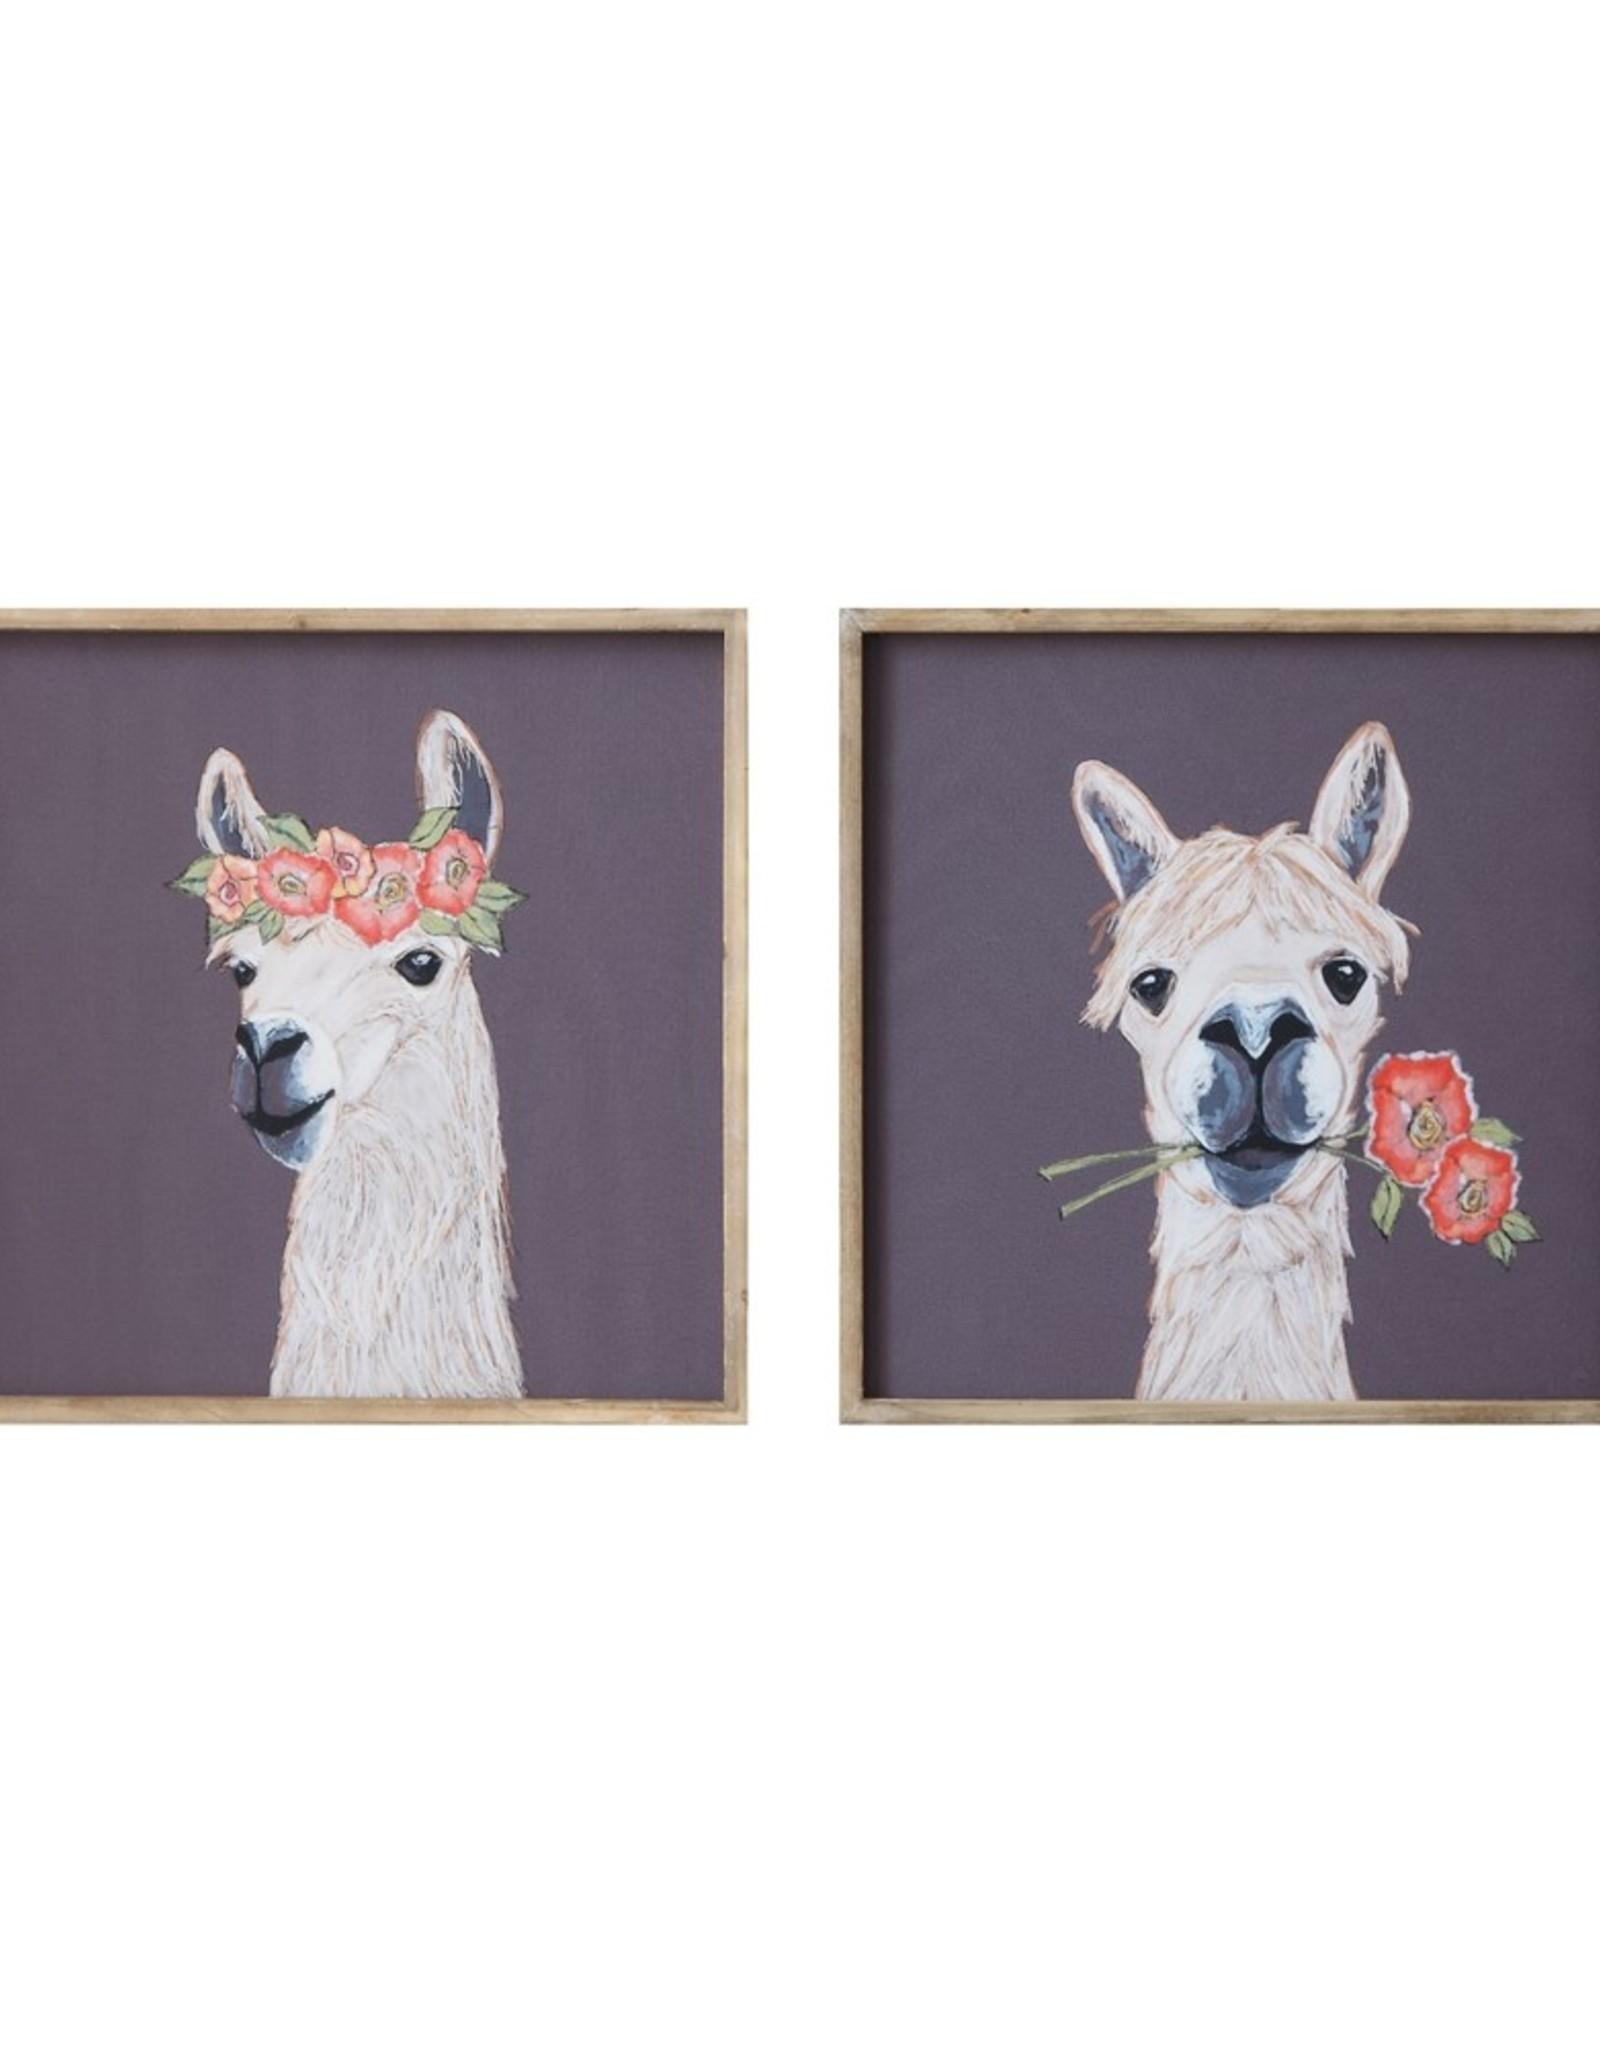 "Creative Co-Op 18"" Square Wood Framed Wall Decor w/ Llama, 2 Styles"